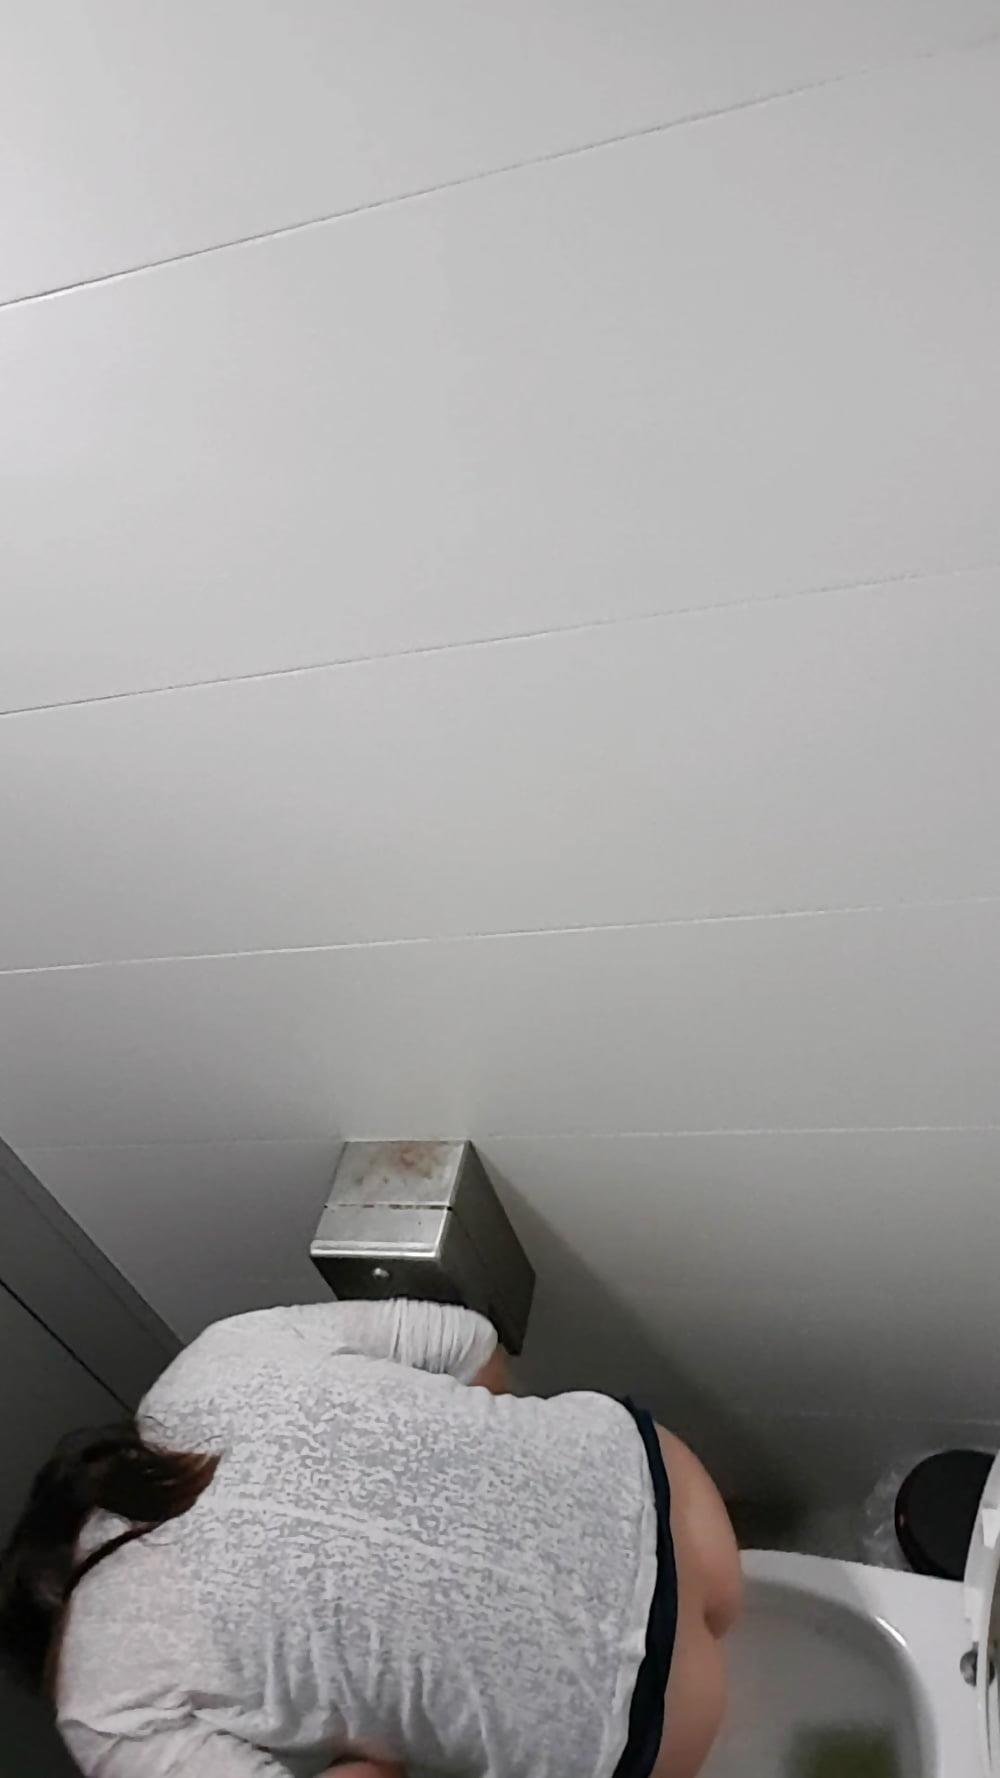 Public toilet spy cam porn-9407